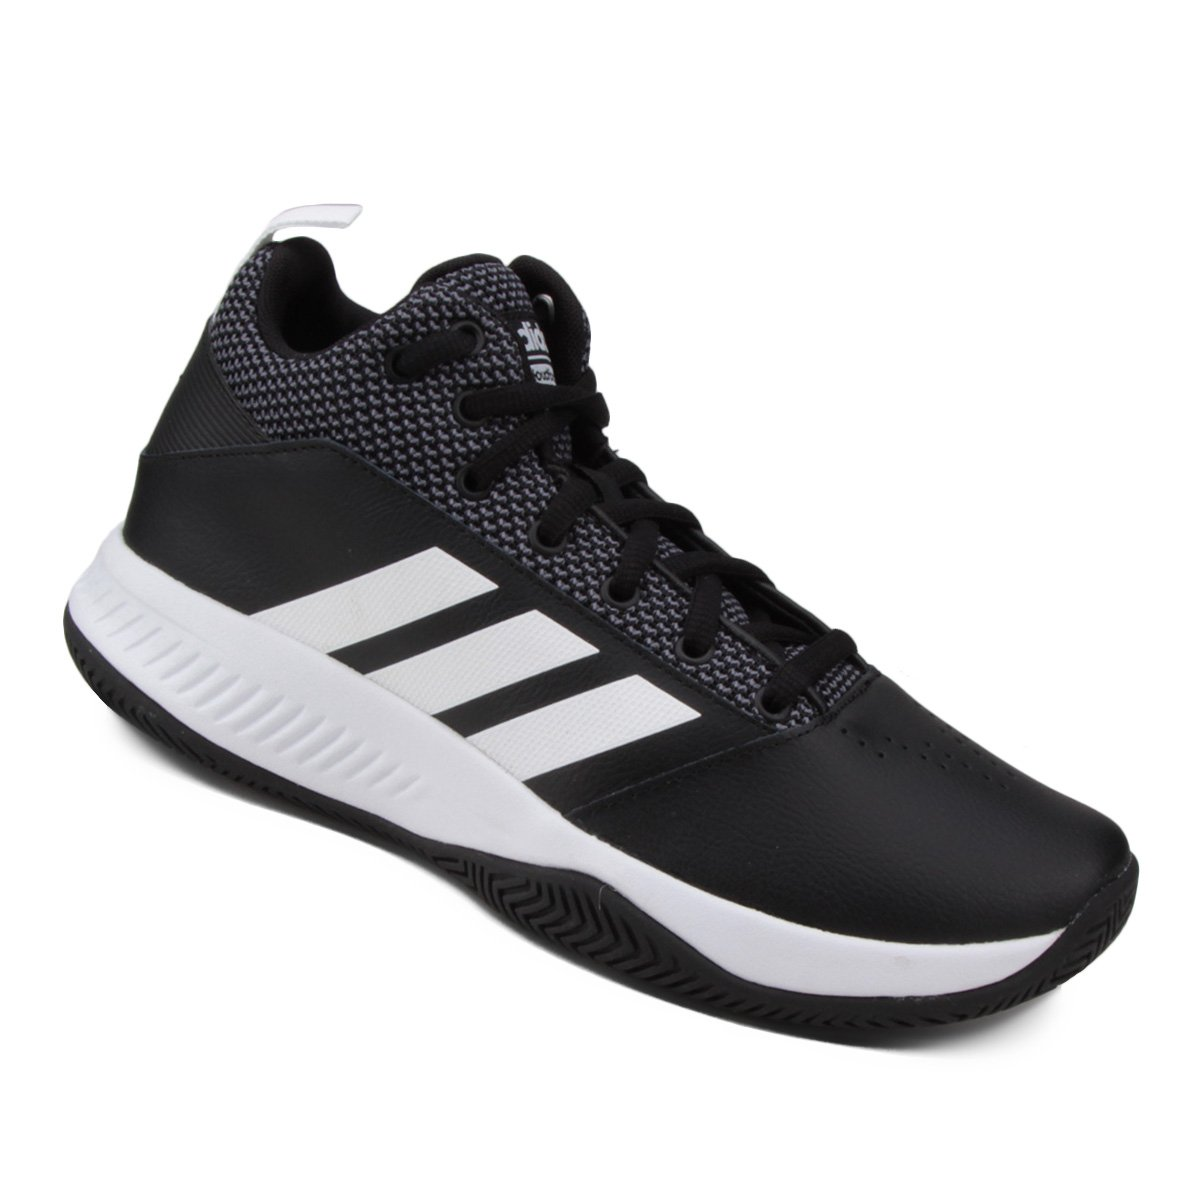 Tênis Adidas CF Ilation 2 Masculino - Compre Agora  8a03d4ca8b215